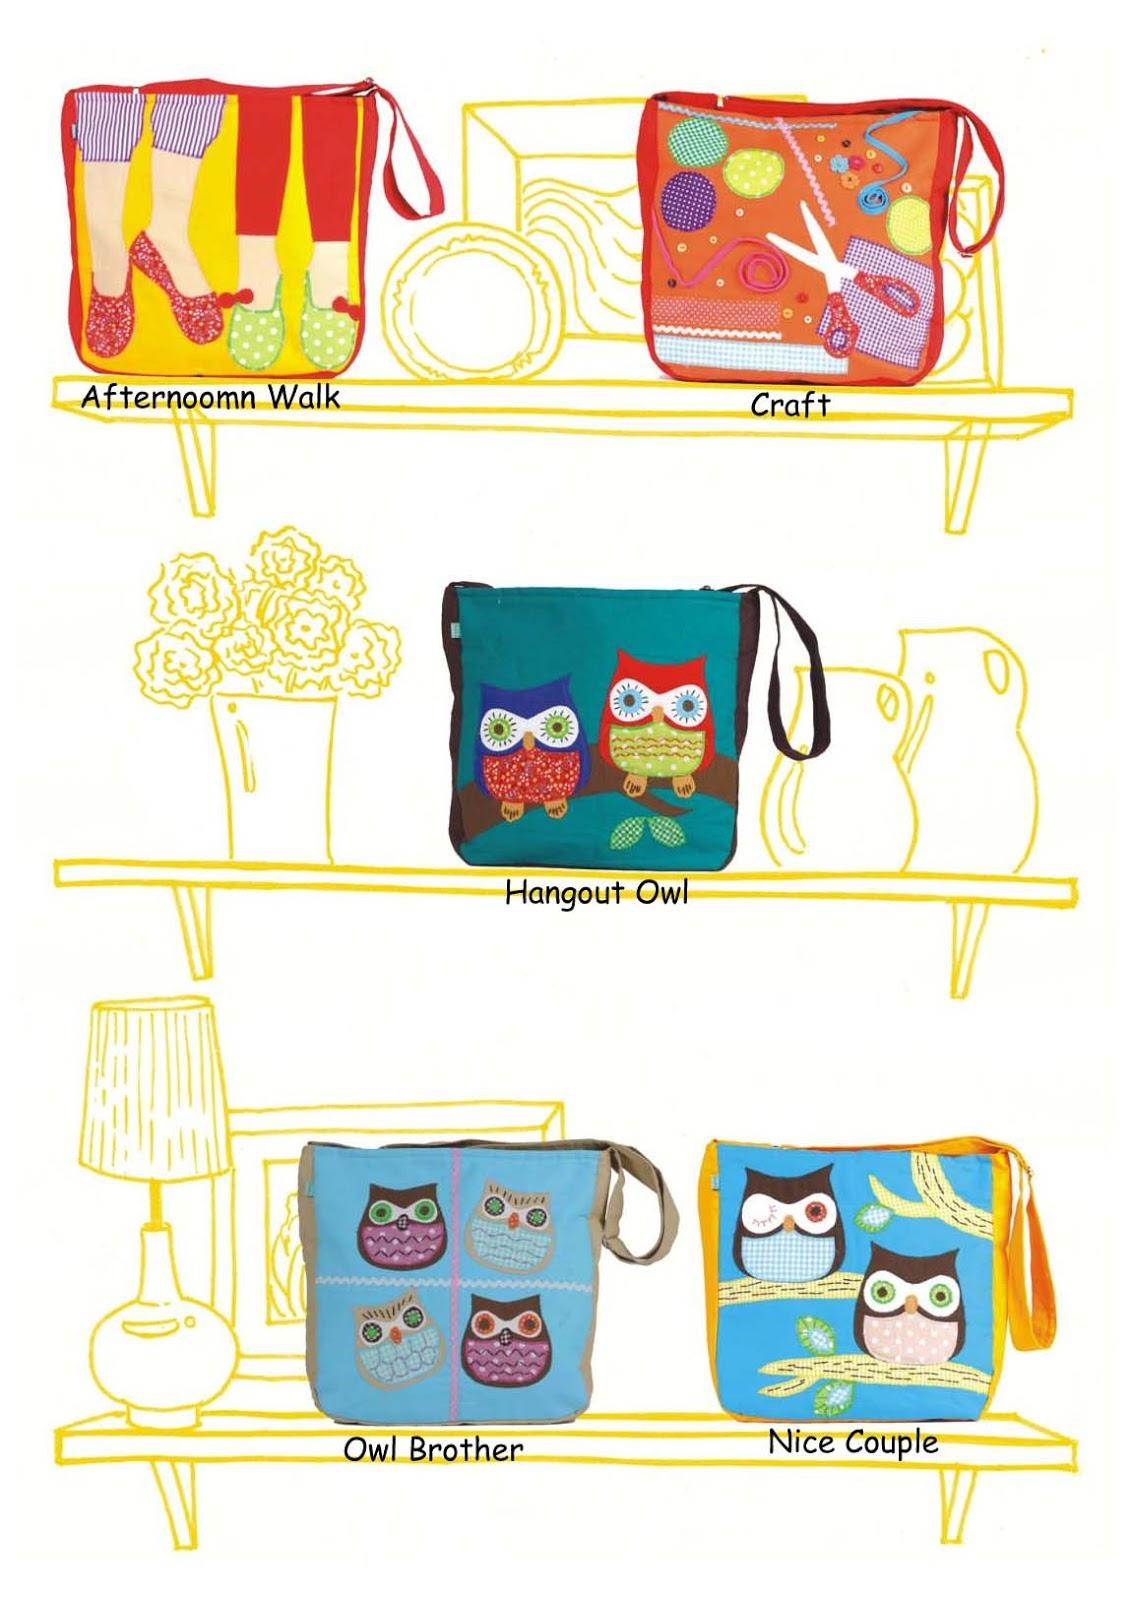 tas-wanita-baru-121.jpg (1132×1600)